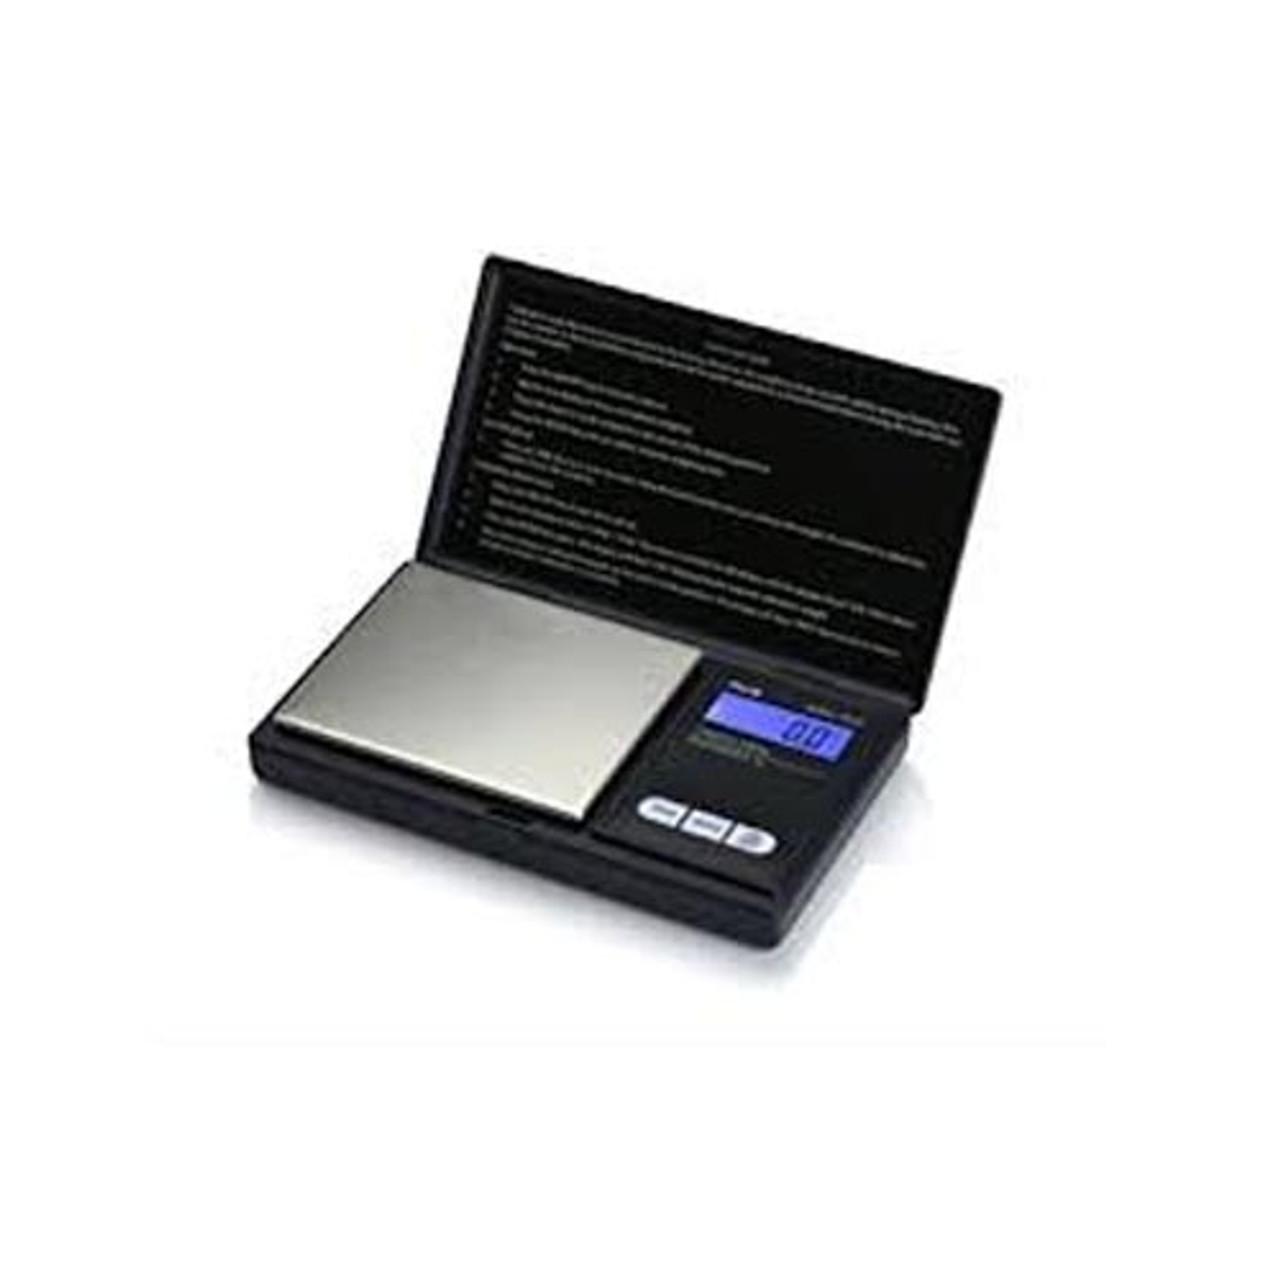 AWS Digital Scale AWS-1KG (1000g x 0.1g) Flip-Open Cover - Black